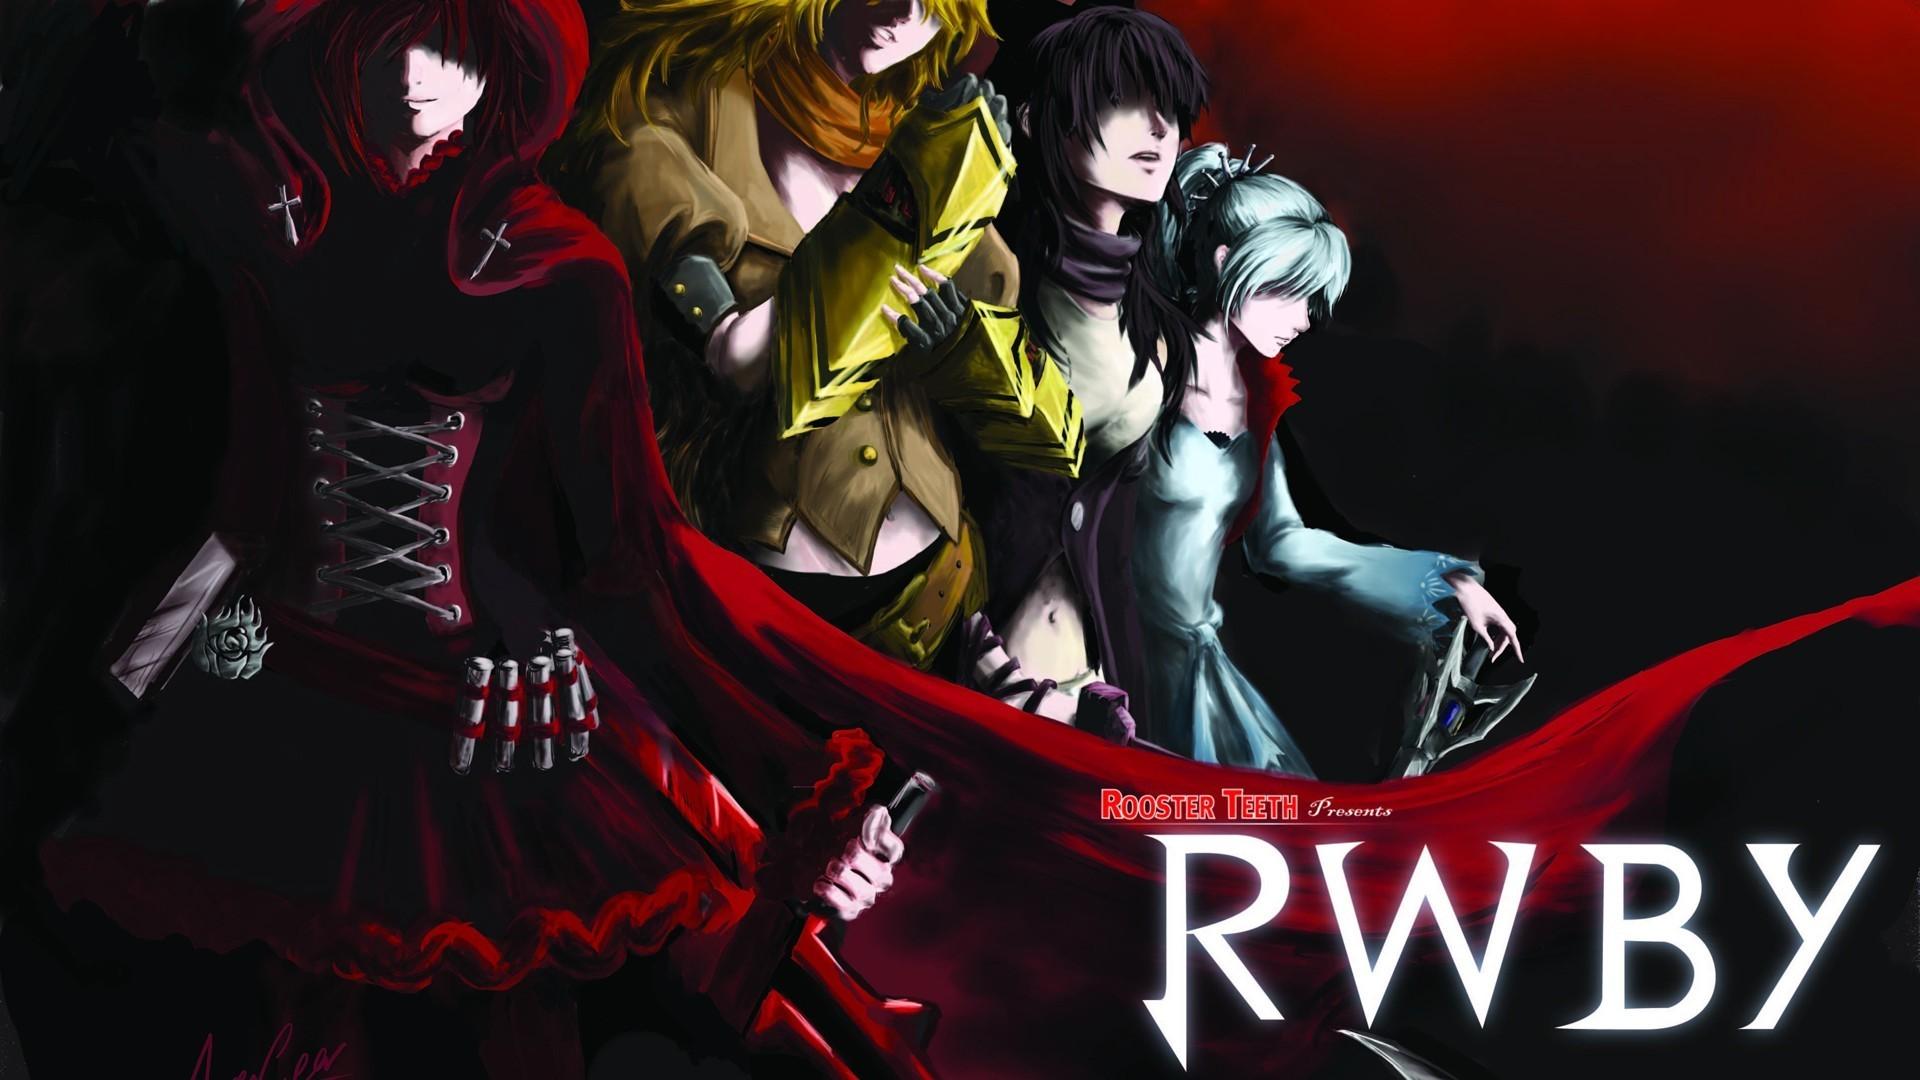 rwby hd wallpaper